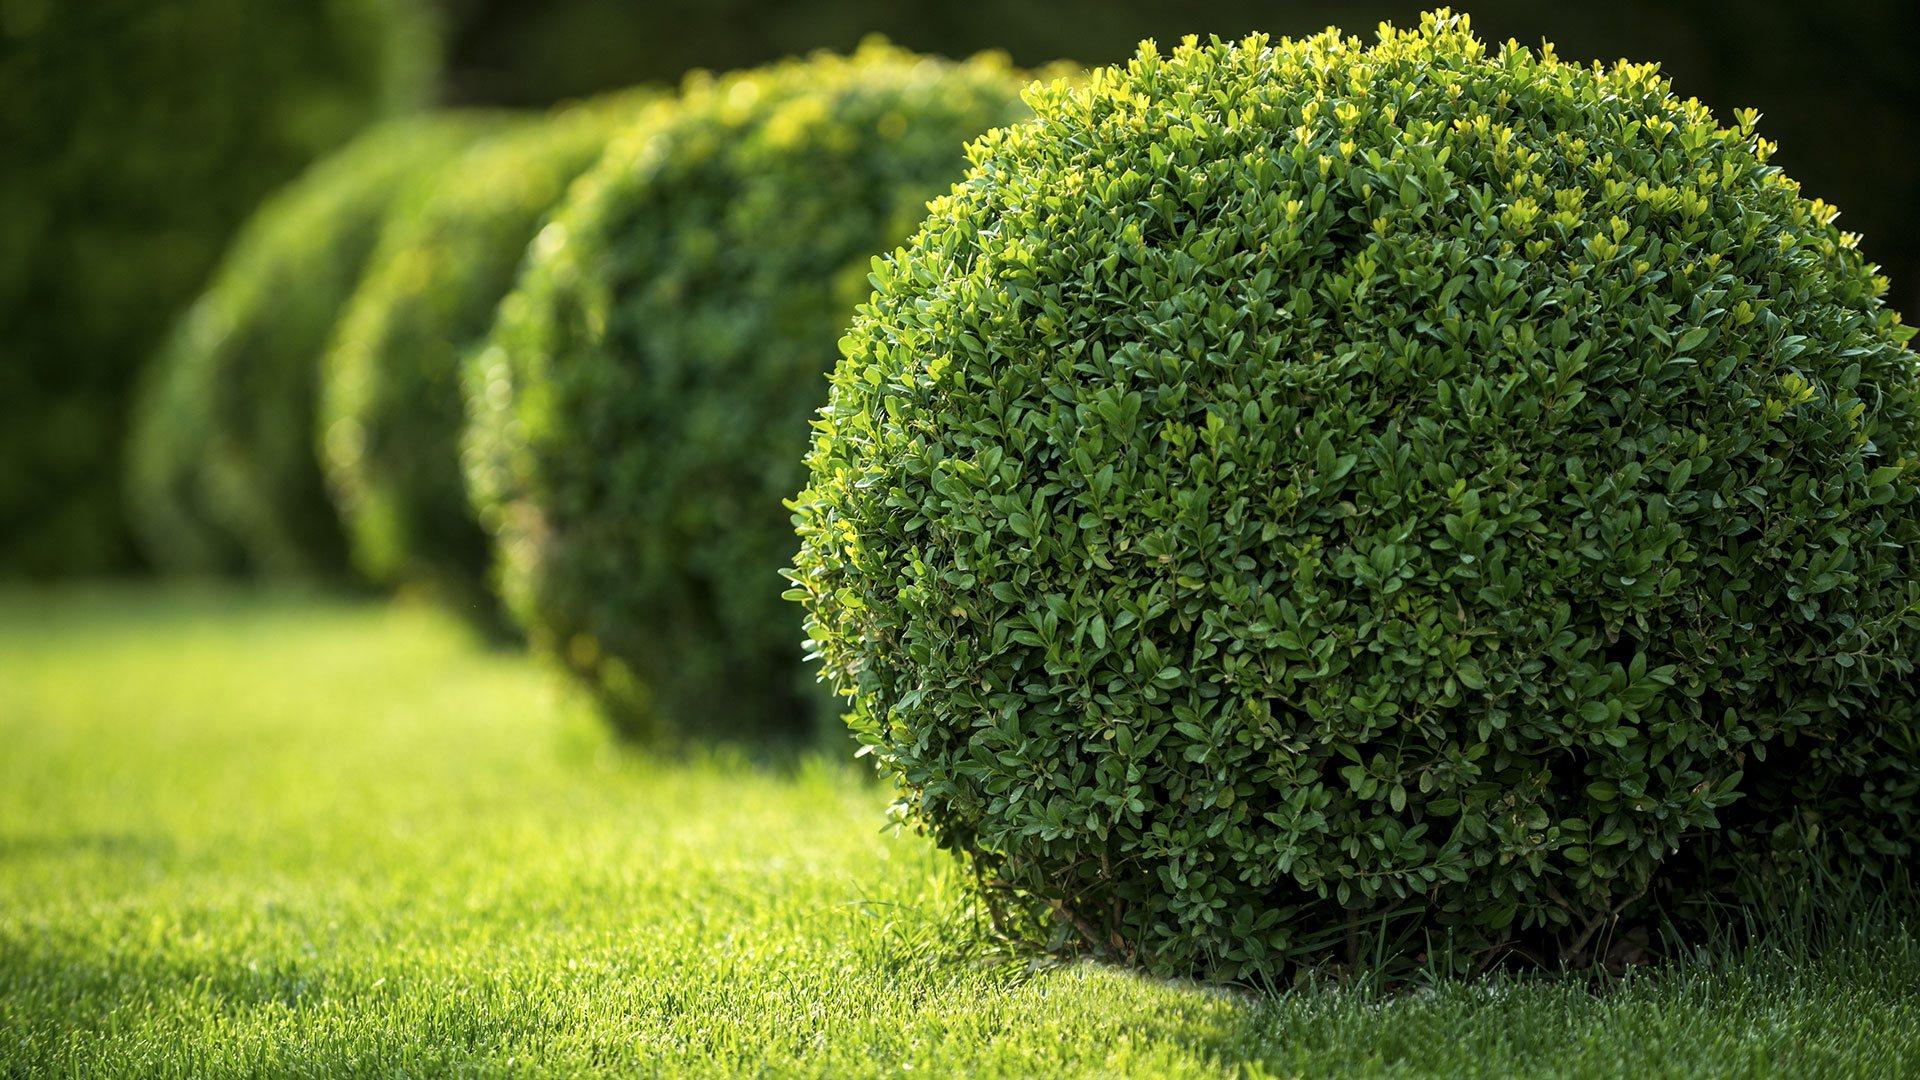 Greenscapes Lawn Services & Landscape Design Lawn Maintenance, Landscaping and Lawn Care slide 1